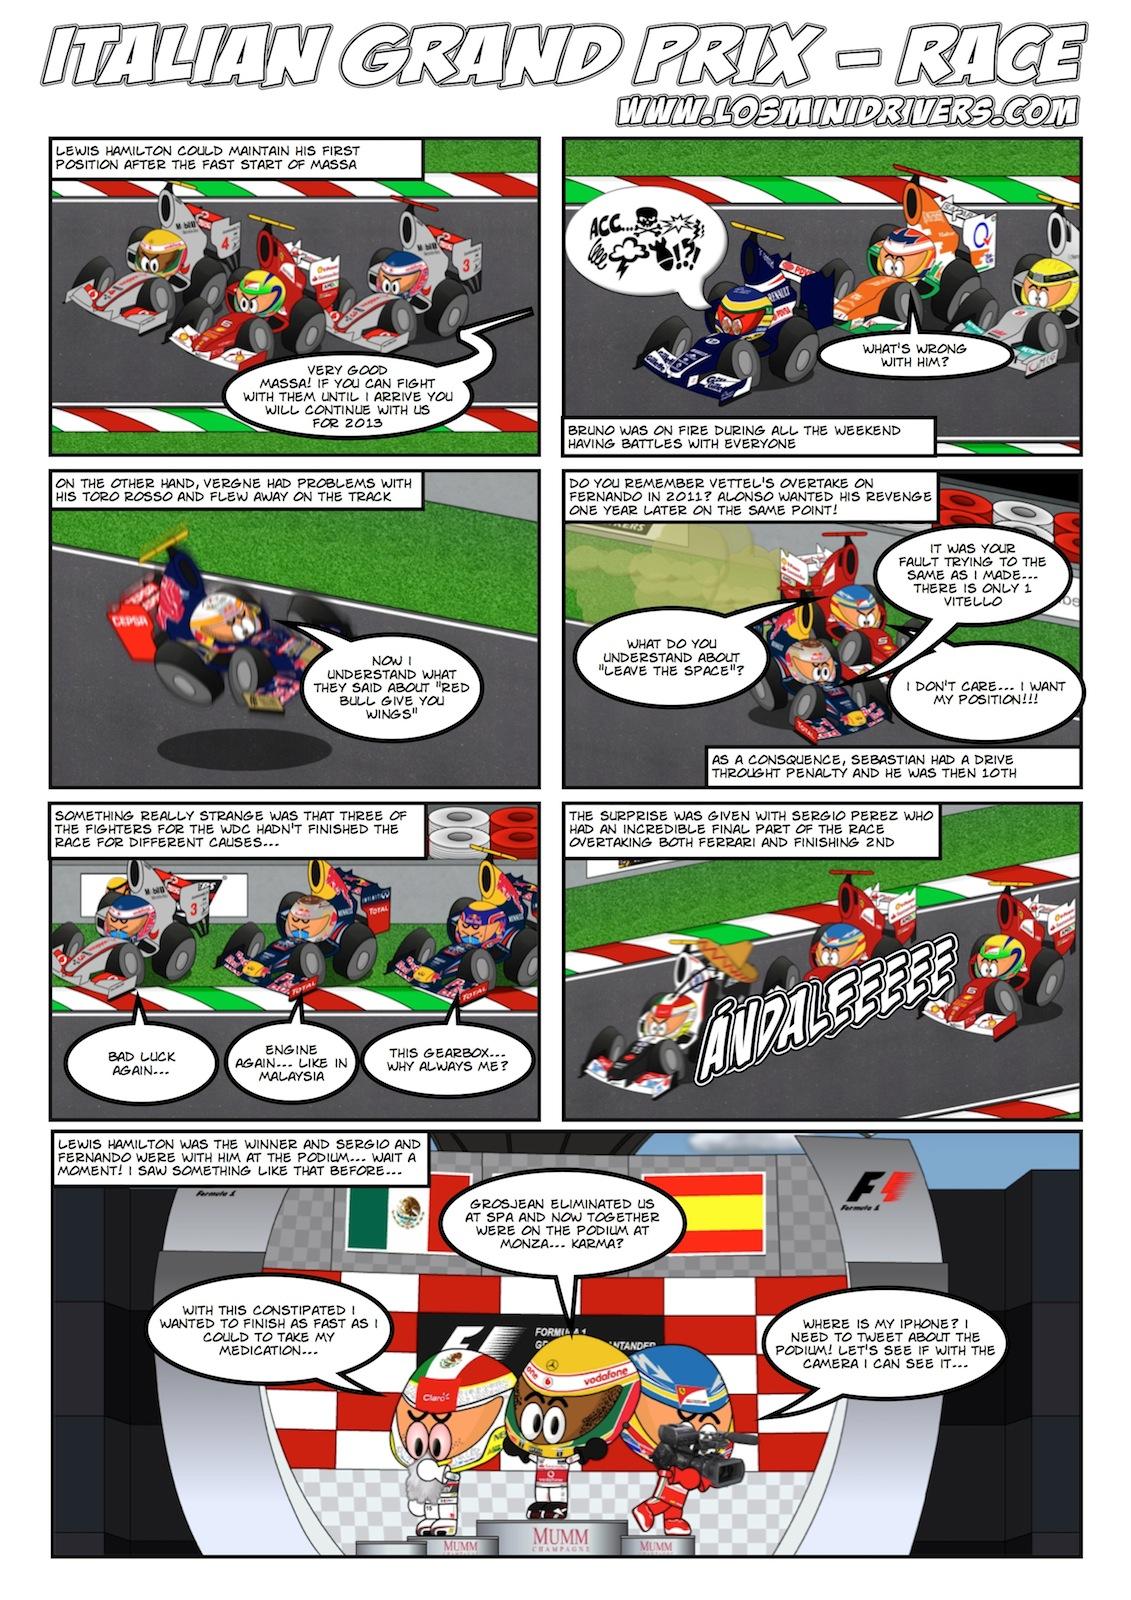 комиксы Los MiniDrivers по гонке на Гран-при Италии 2012